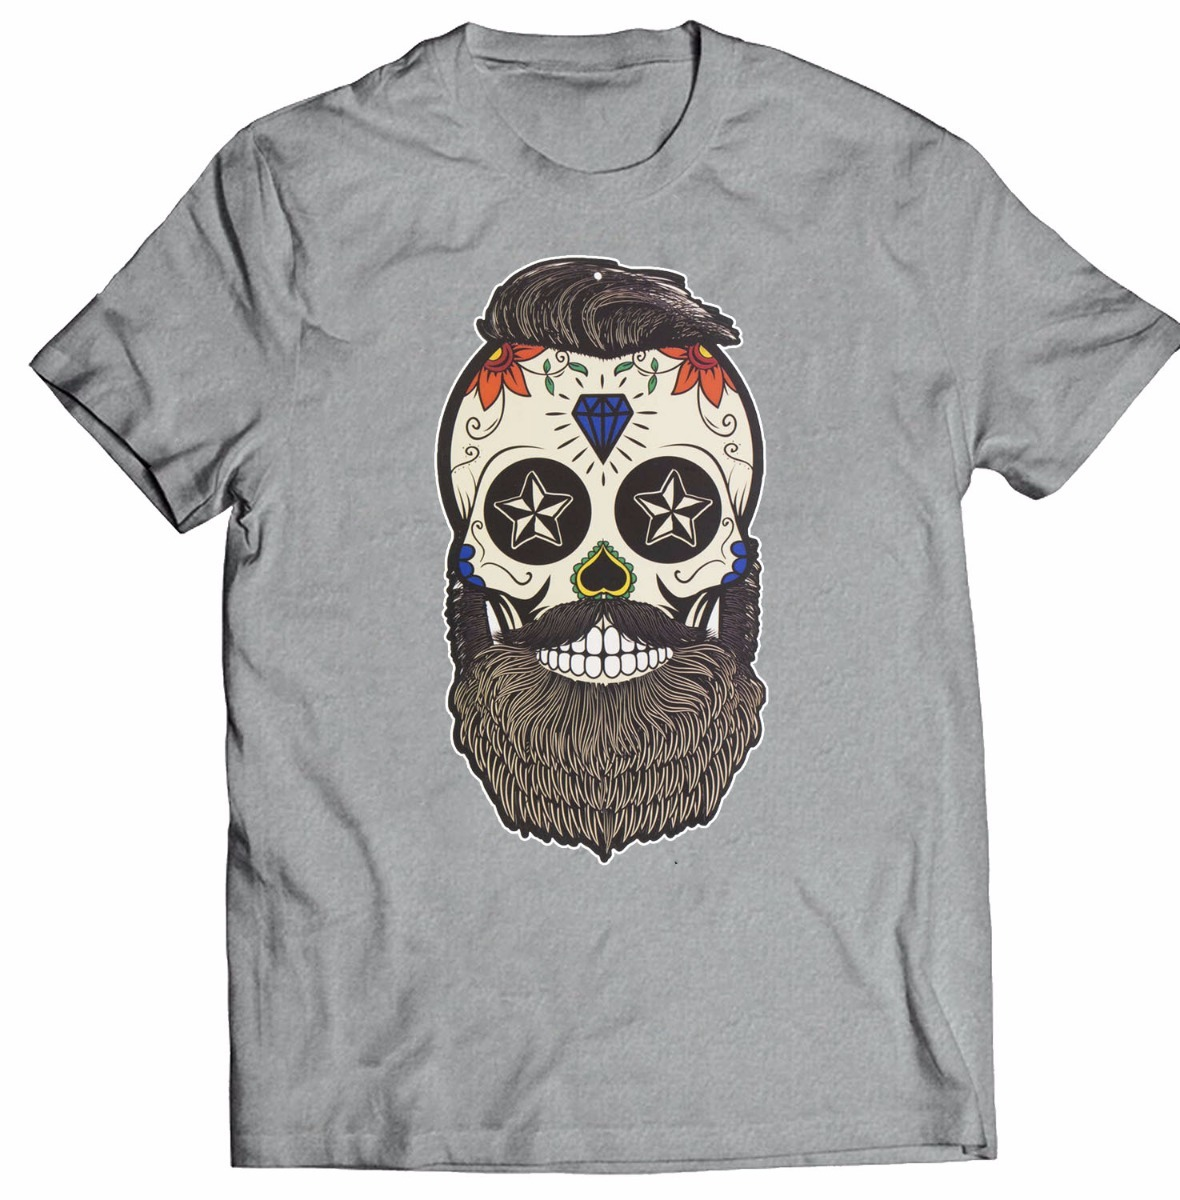 8ac408f94 camisa infantil caveira barbada camiseta caveira barba cd 0. Carregando  zoom.